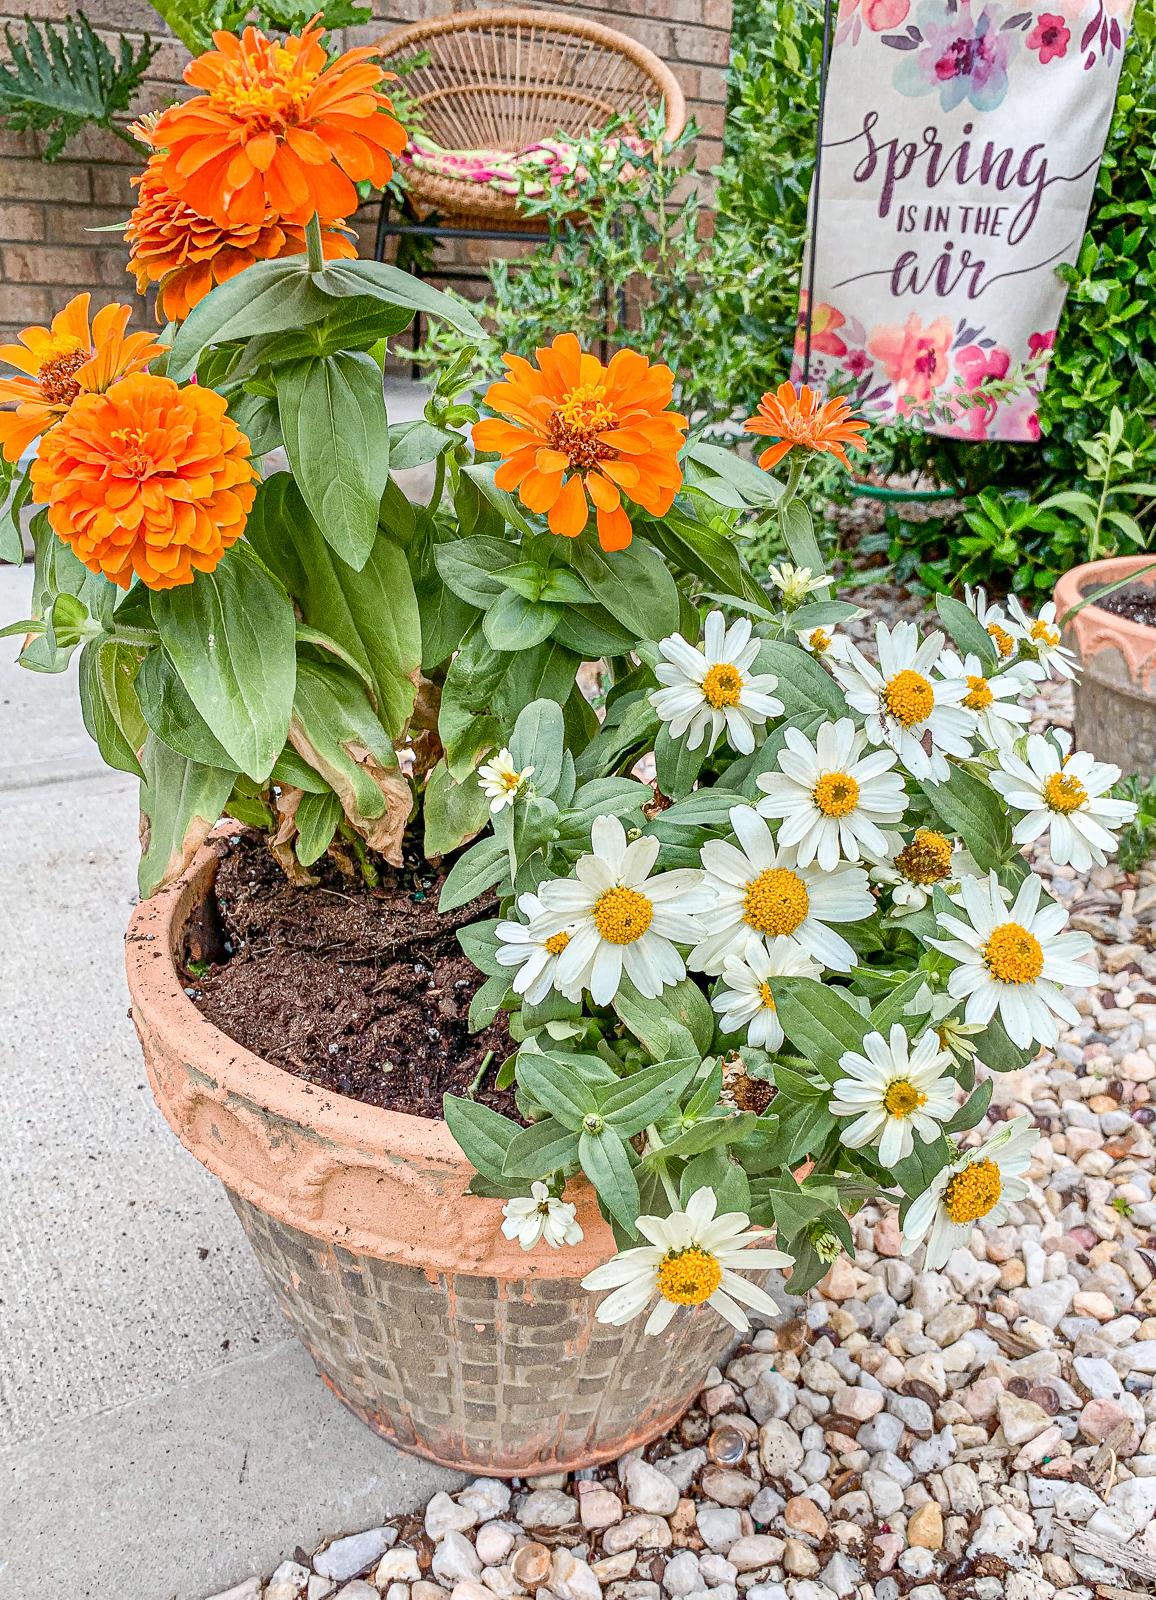 summer, planting, diy, pots, yard, landscape, daisies,